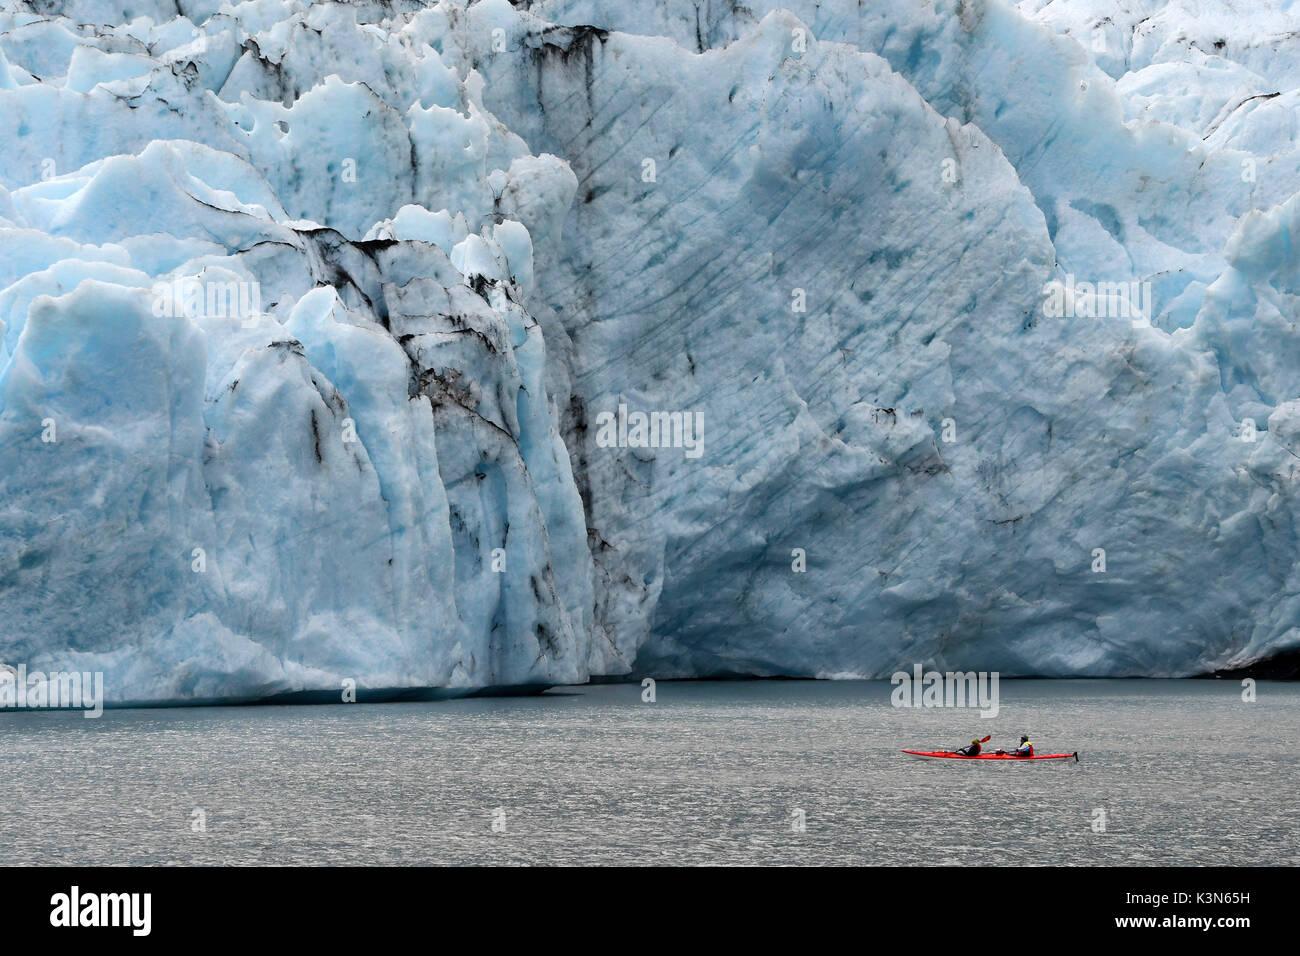 Red canoe (kayak) close to glacier front, Portage glacier, Alaska,USA - Stock Image